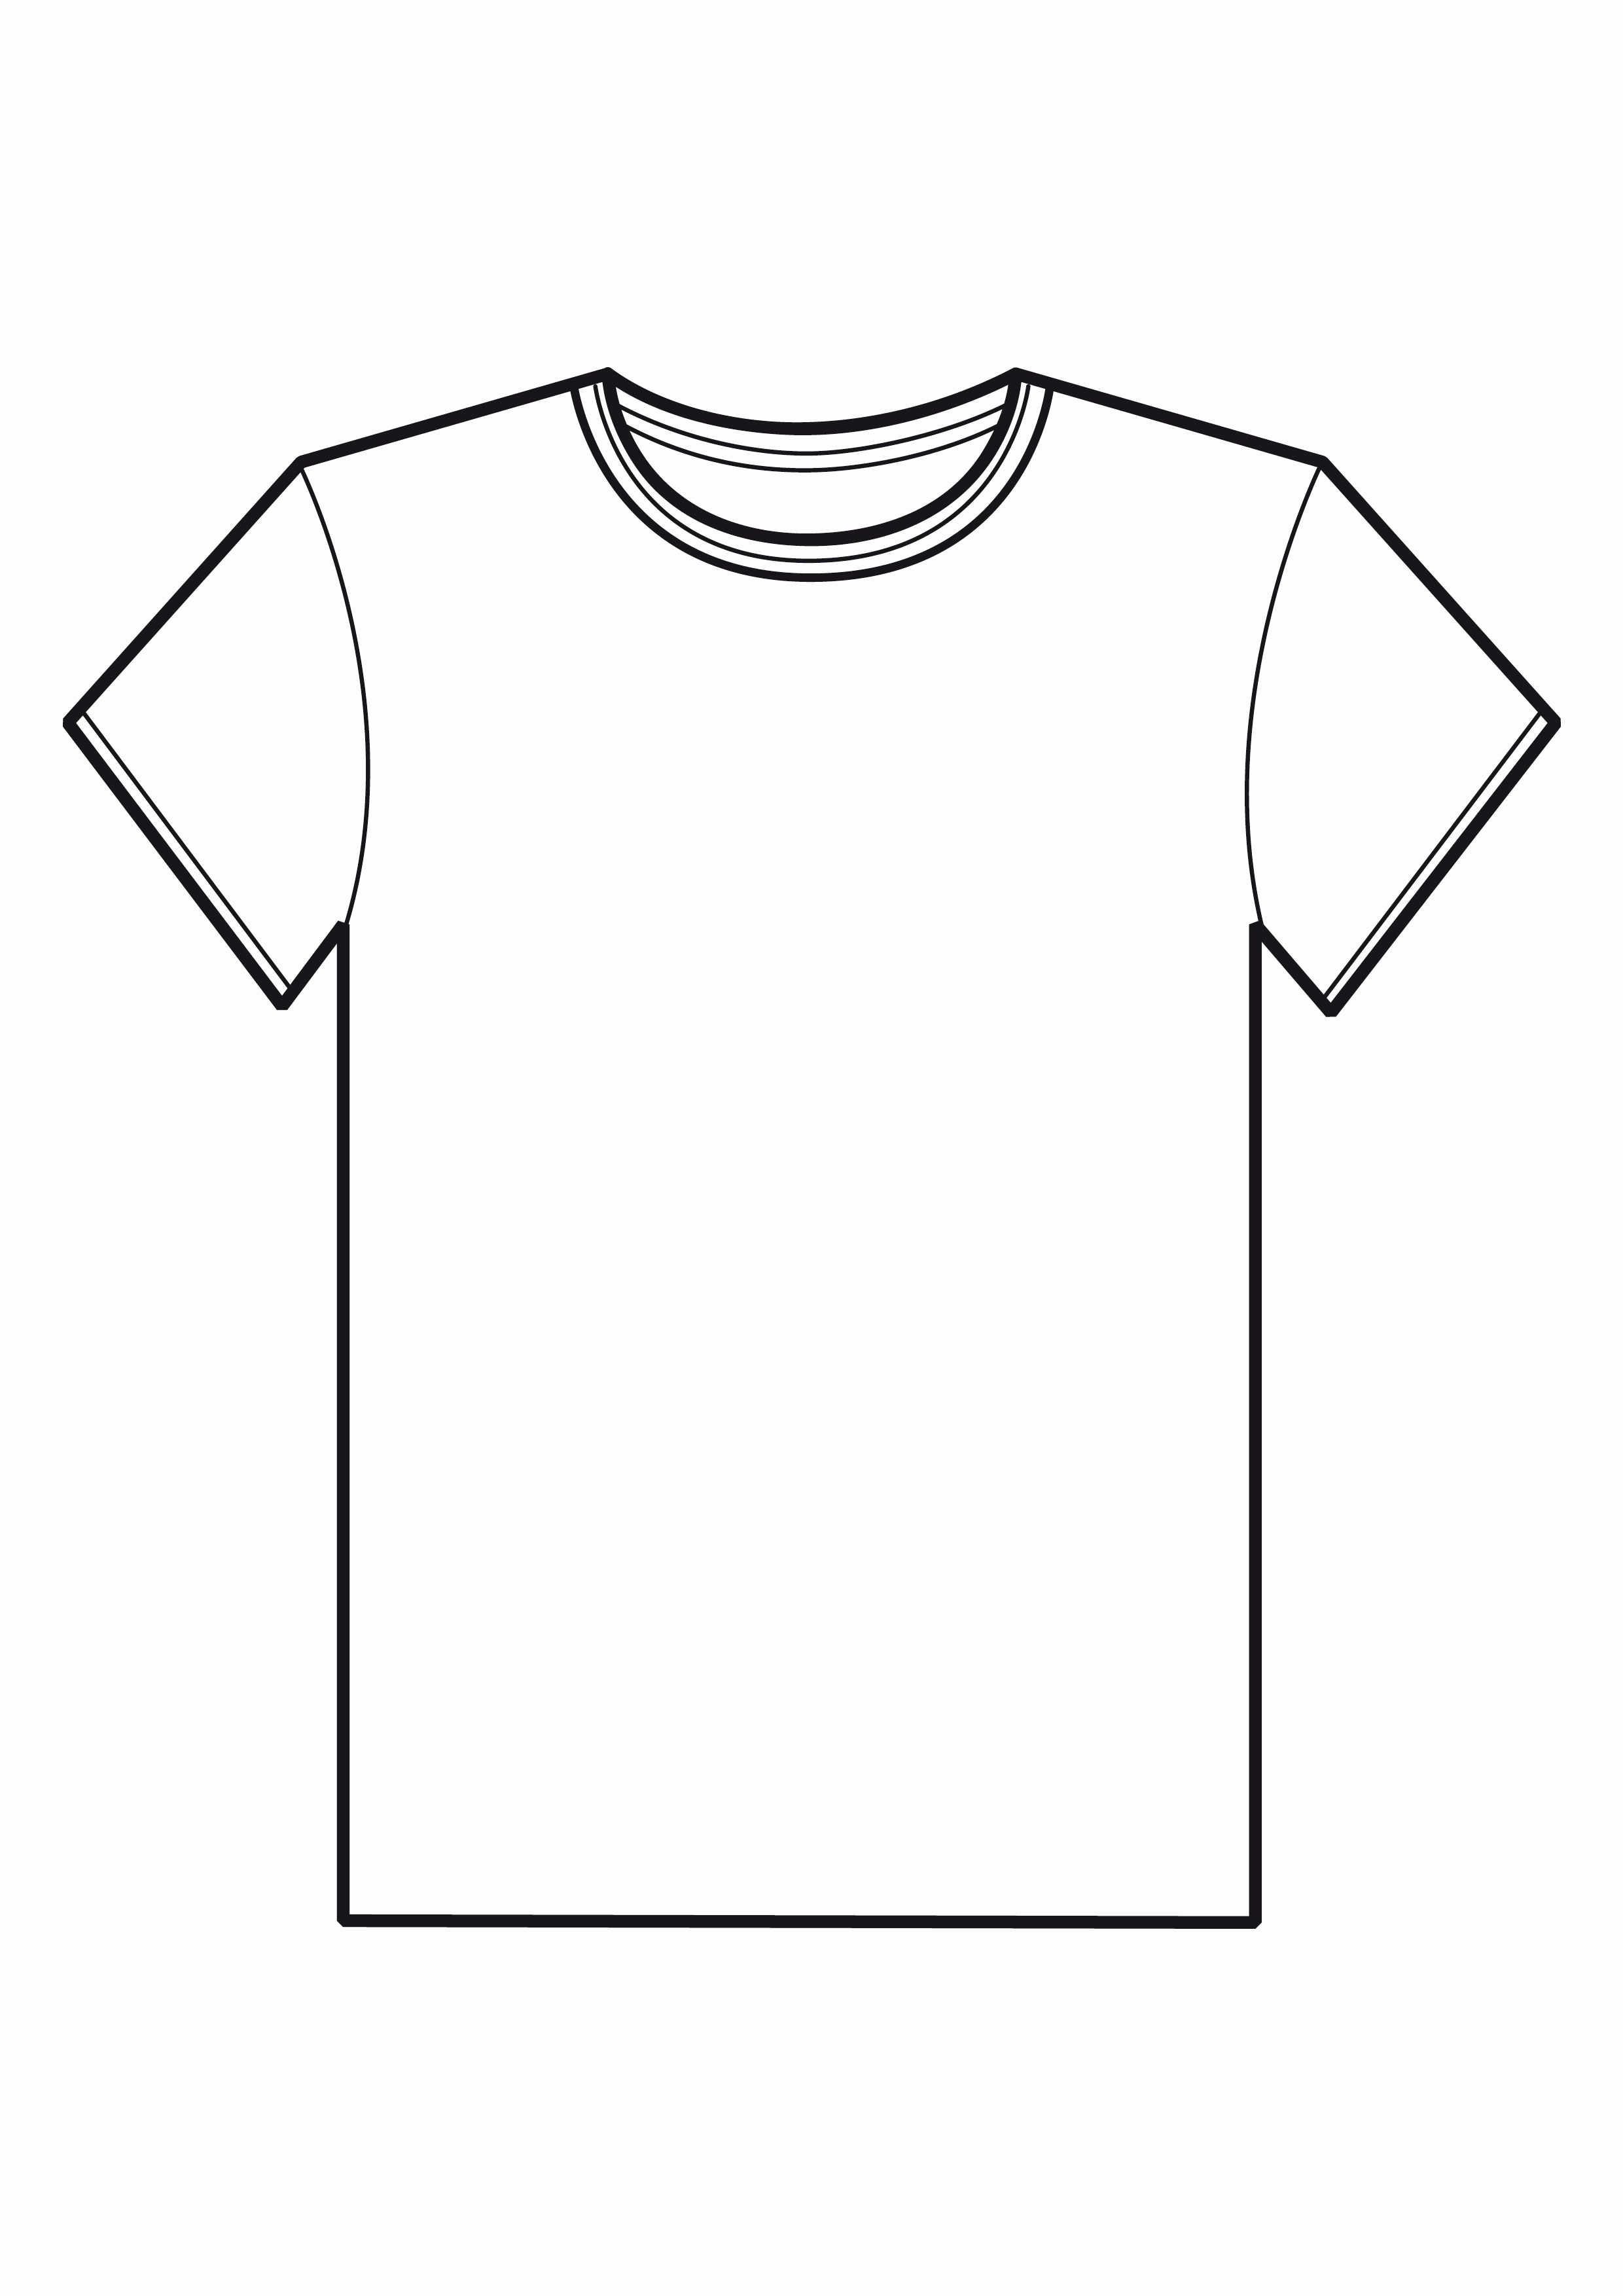 T shirt clipart design freeuse 016 Template Ideas Free T Shirt Design Best Of Clipart ... freeuse